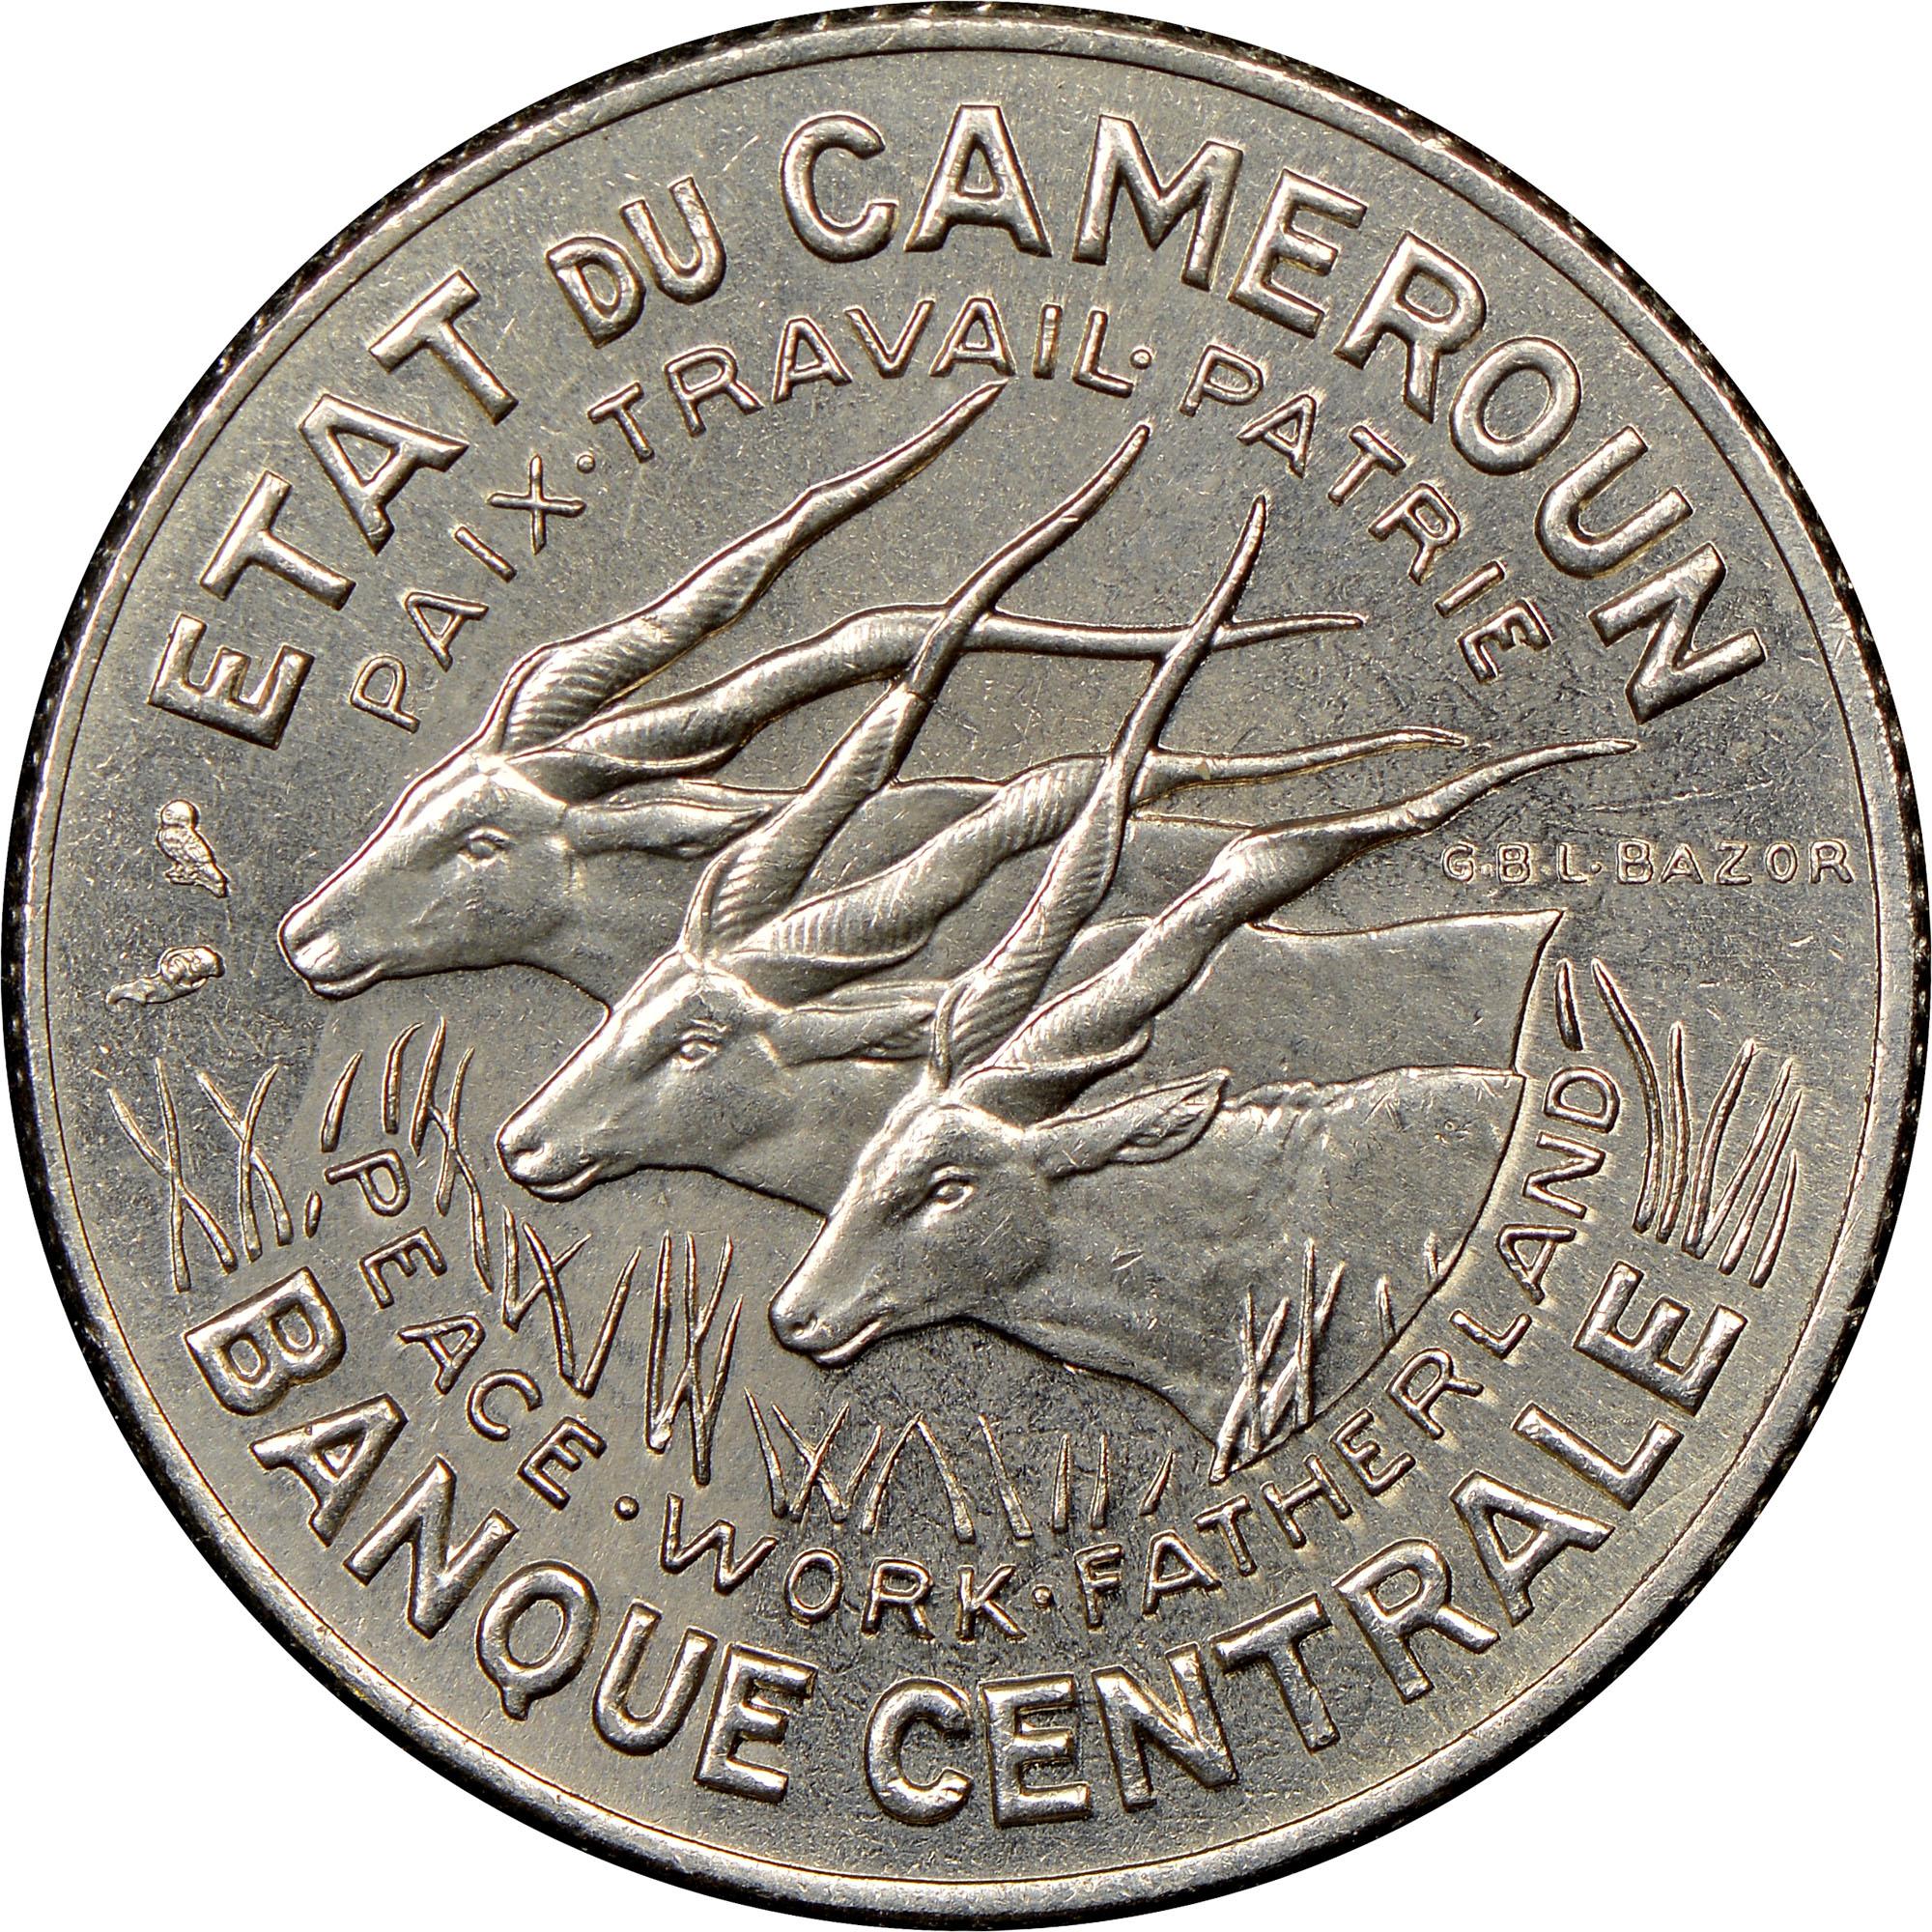 Cameroon 100 Francs obverse